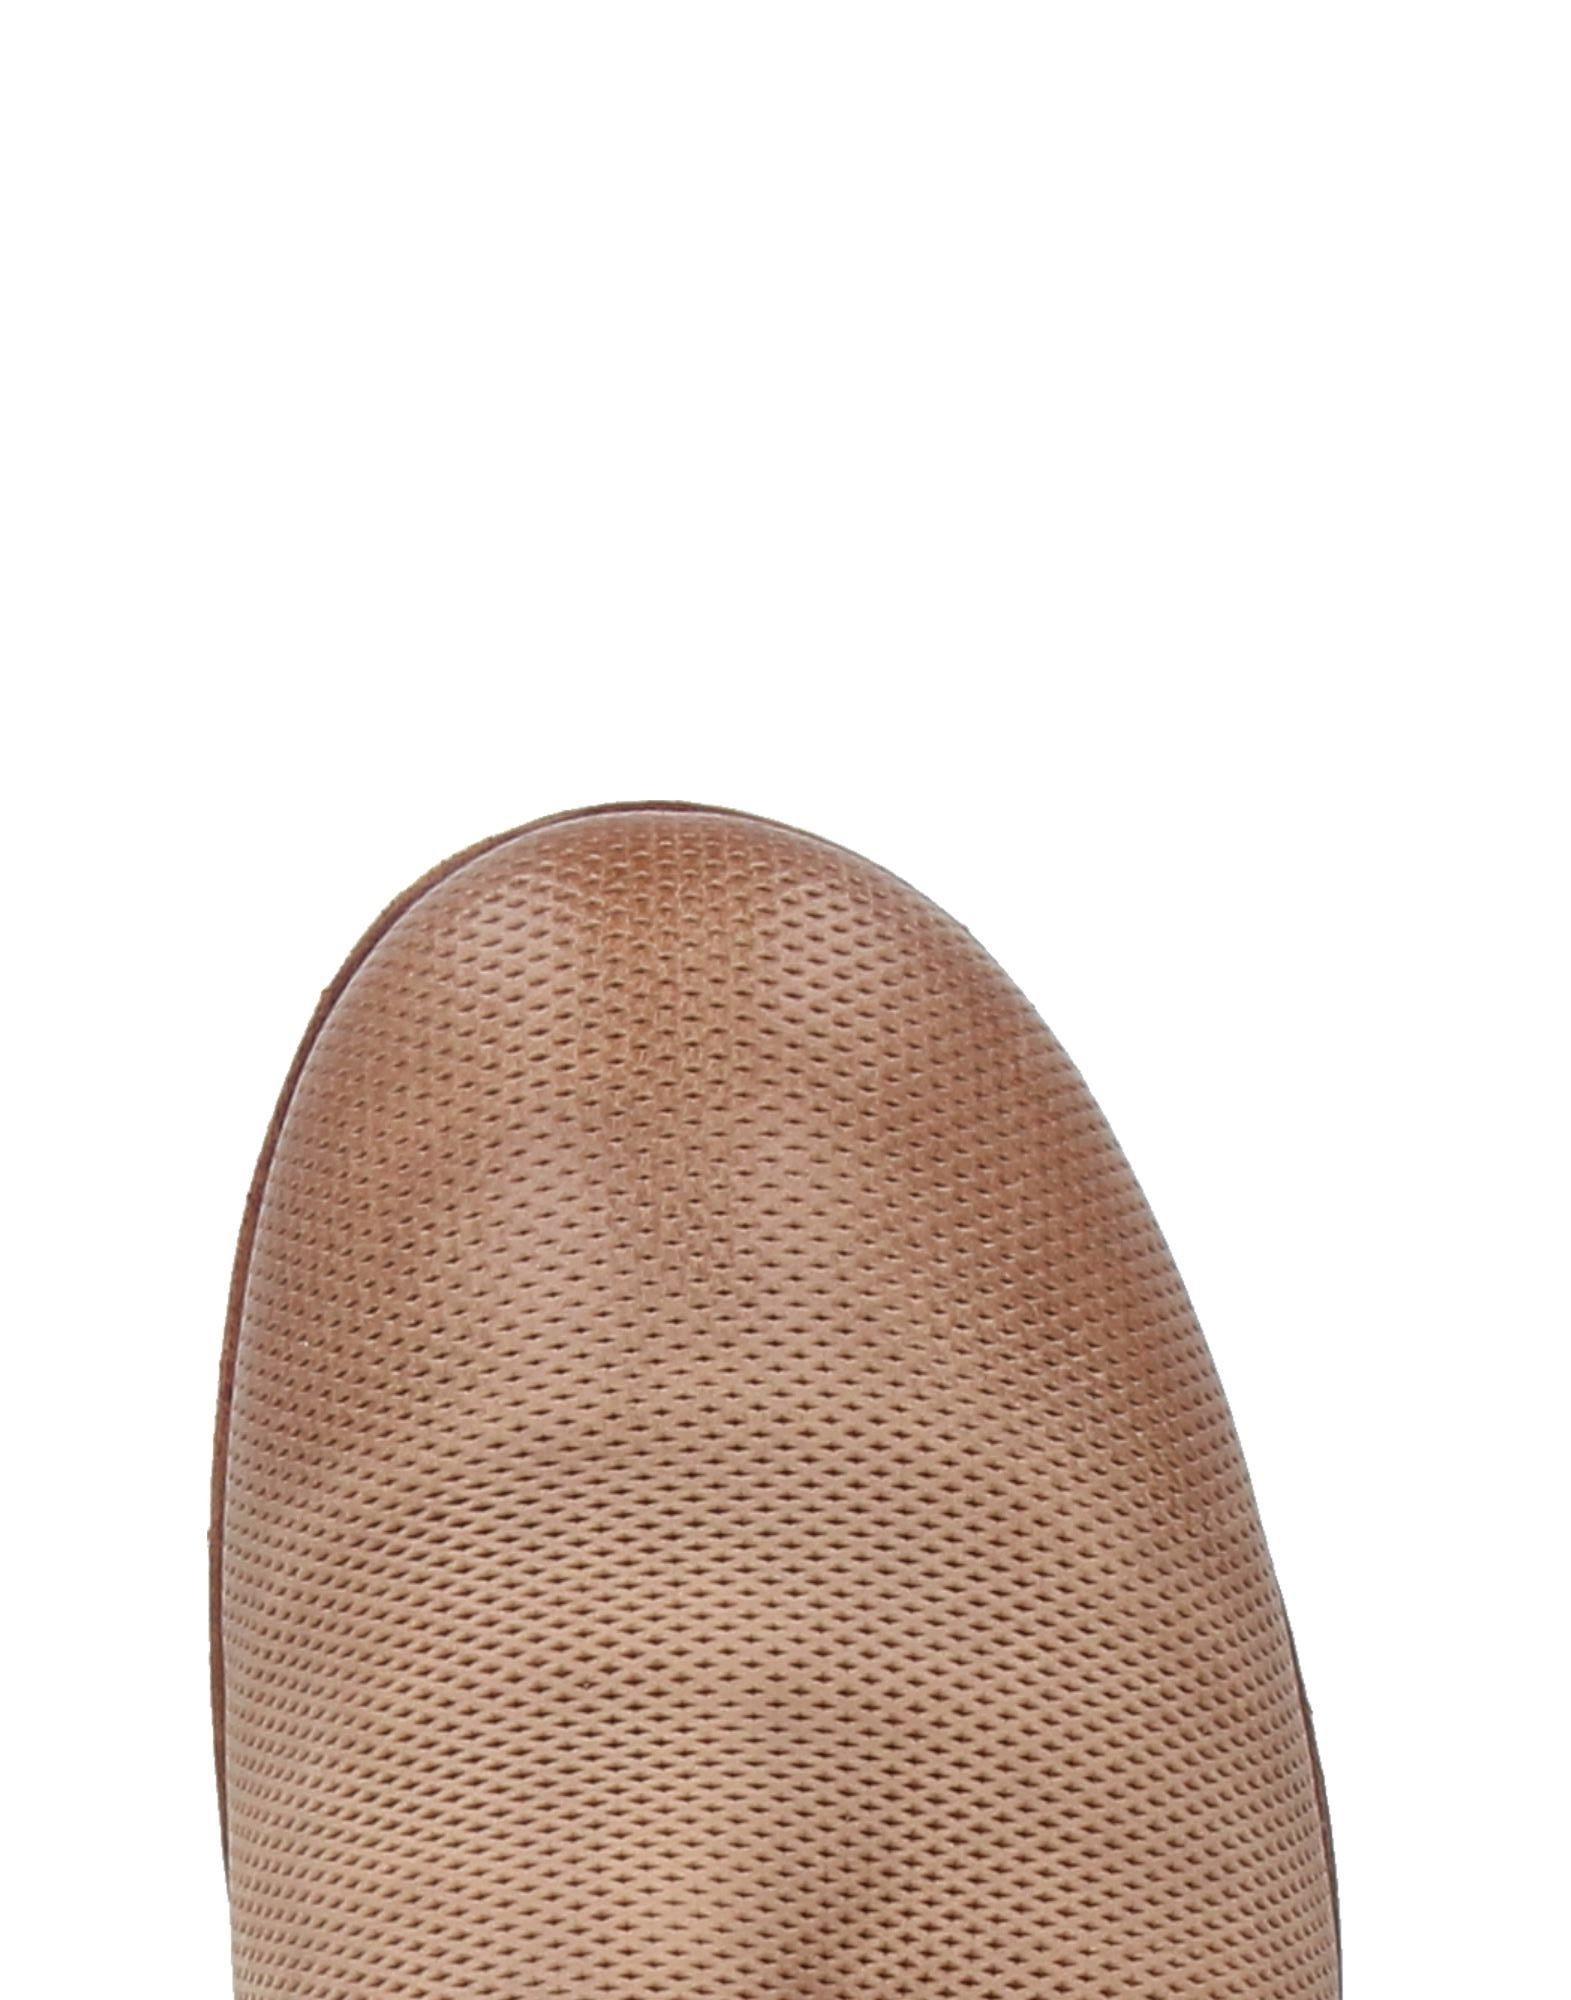 Chaussures - Chaussures Lacées Icône Laboratoire wyZVUs